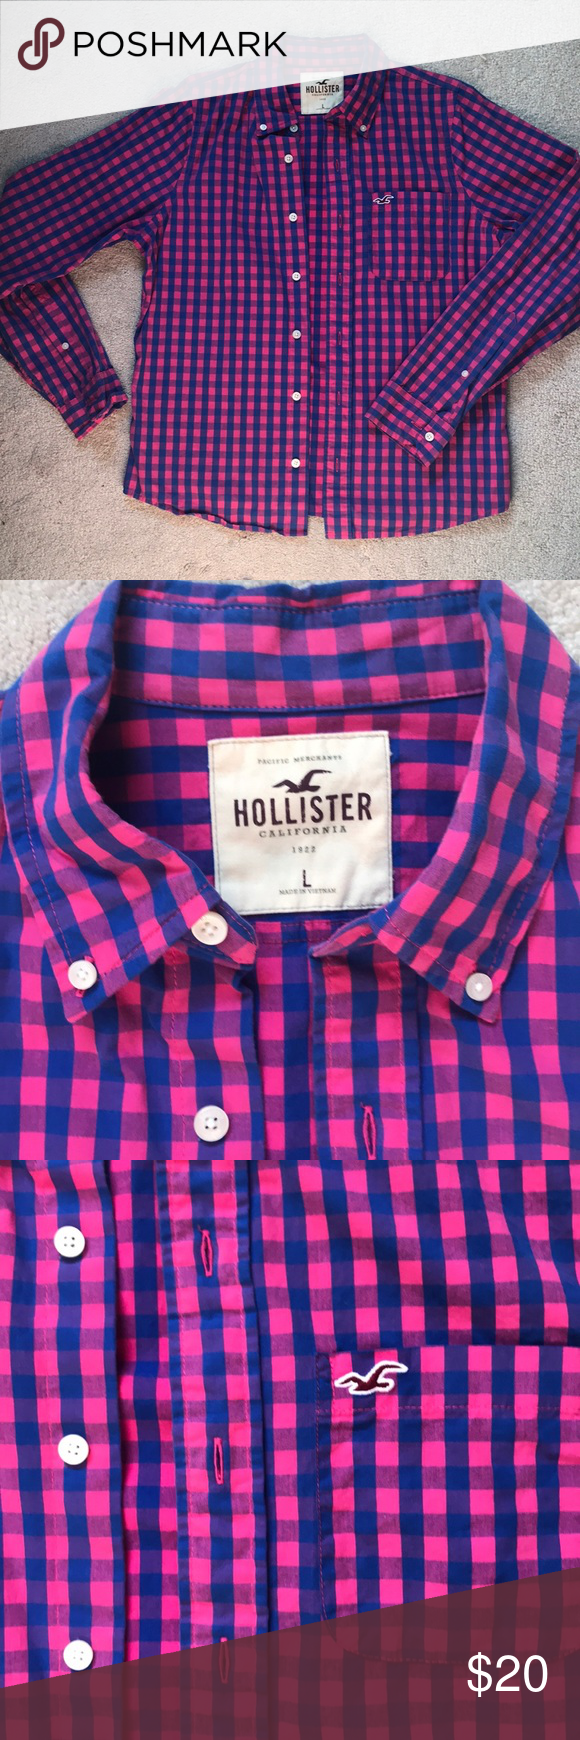 Casual pink dress shirt  Menus checkered pink and blue button down shirt  My Posh Closet